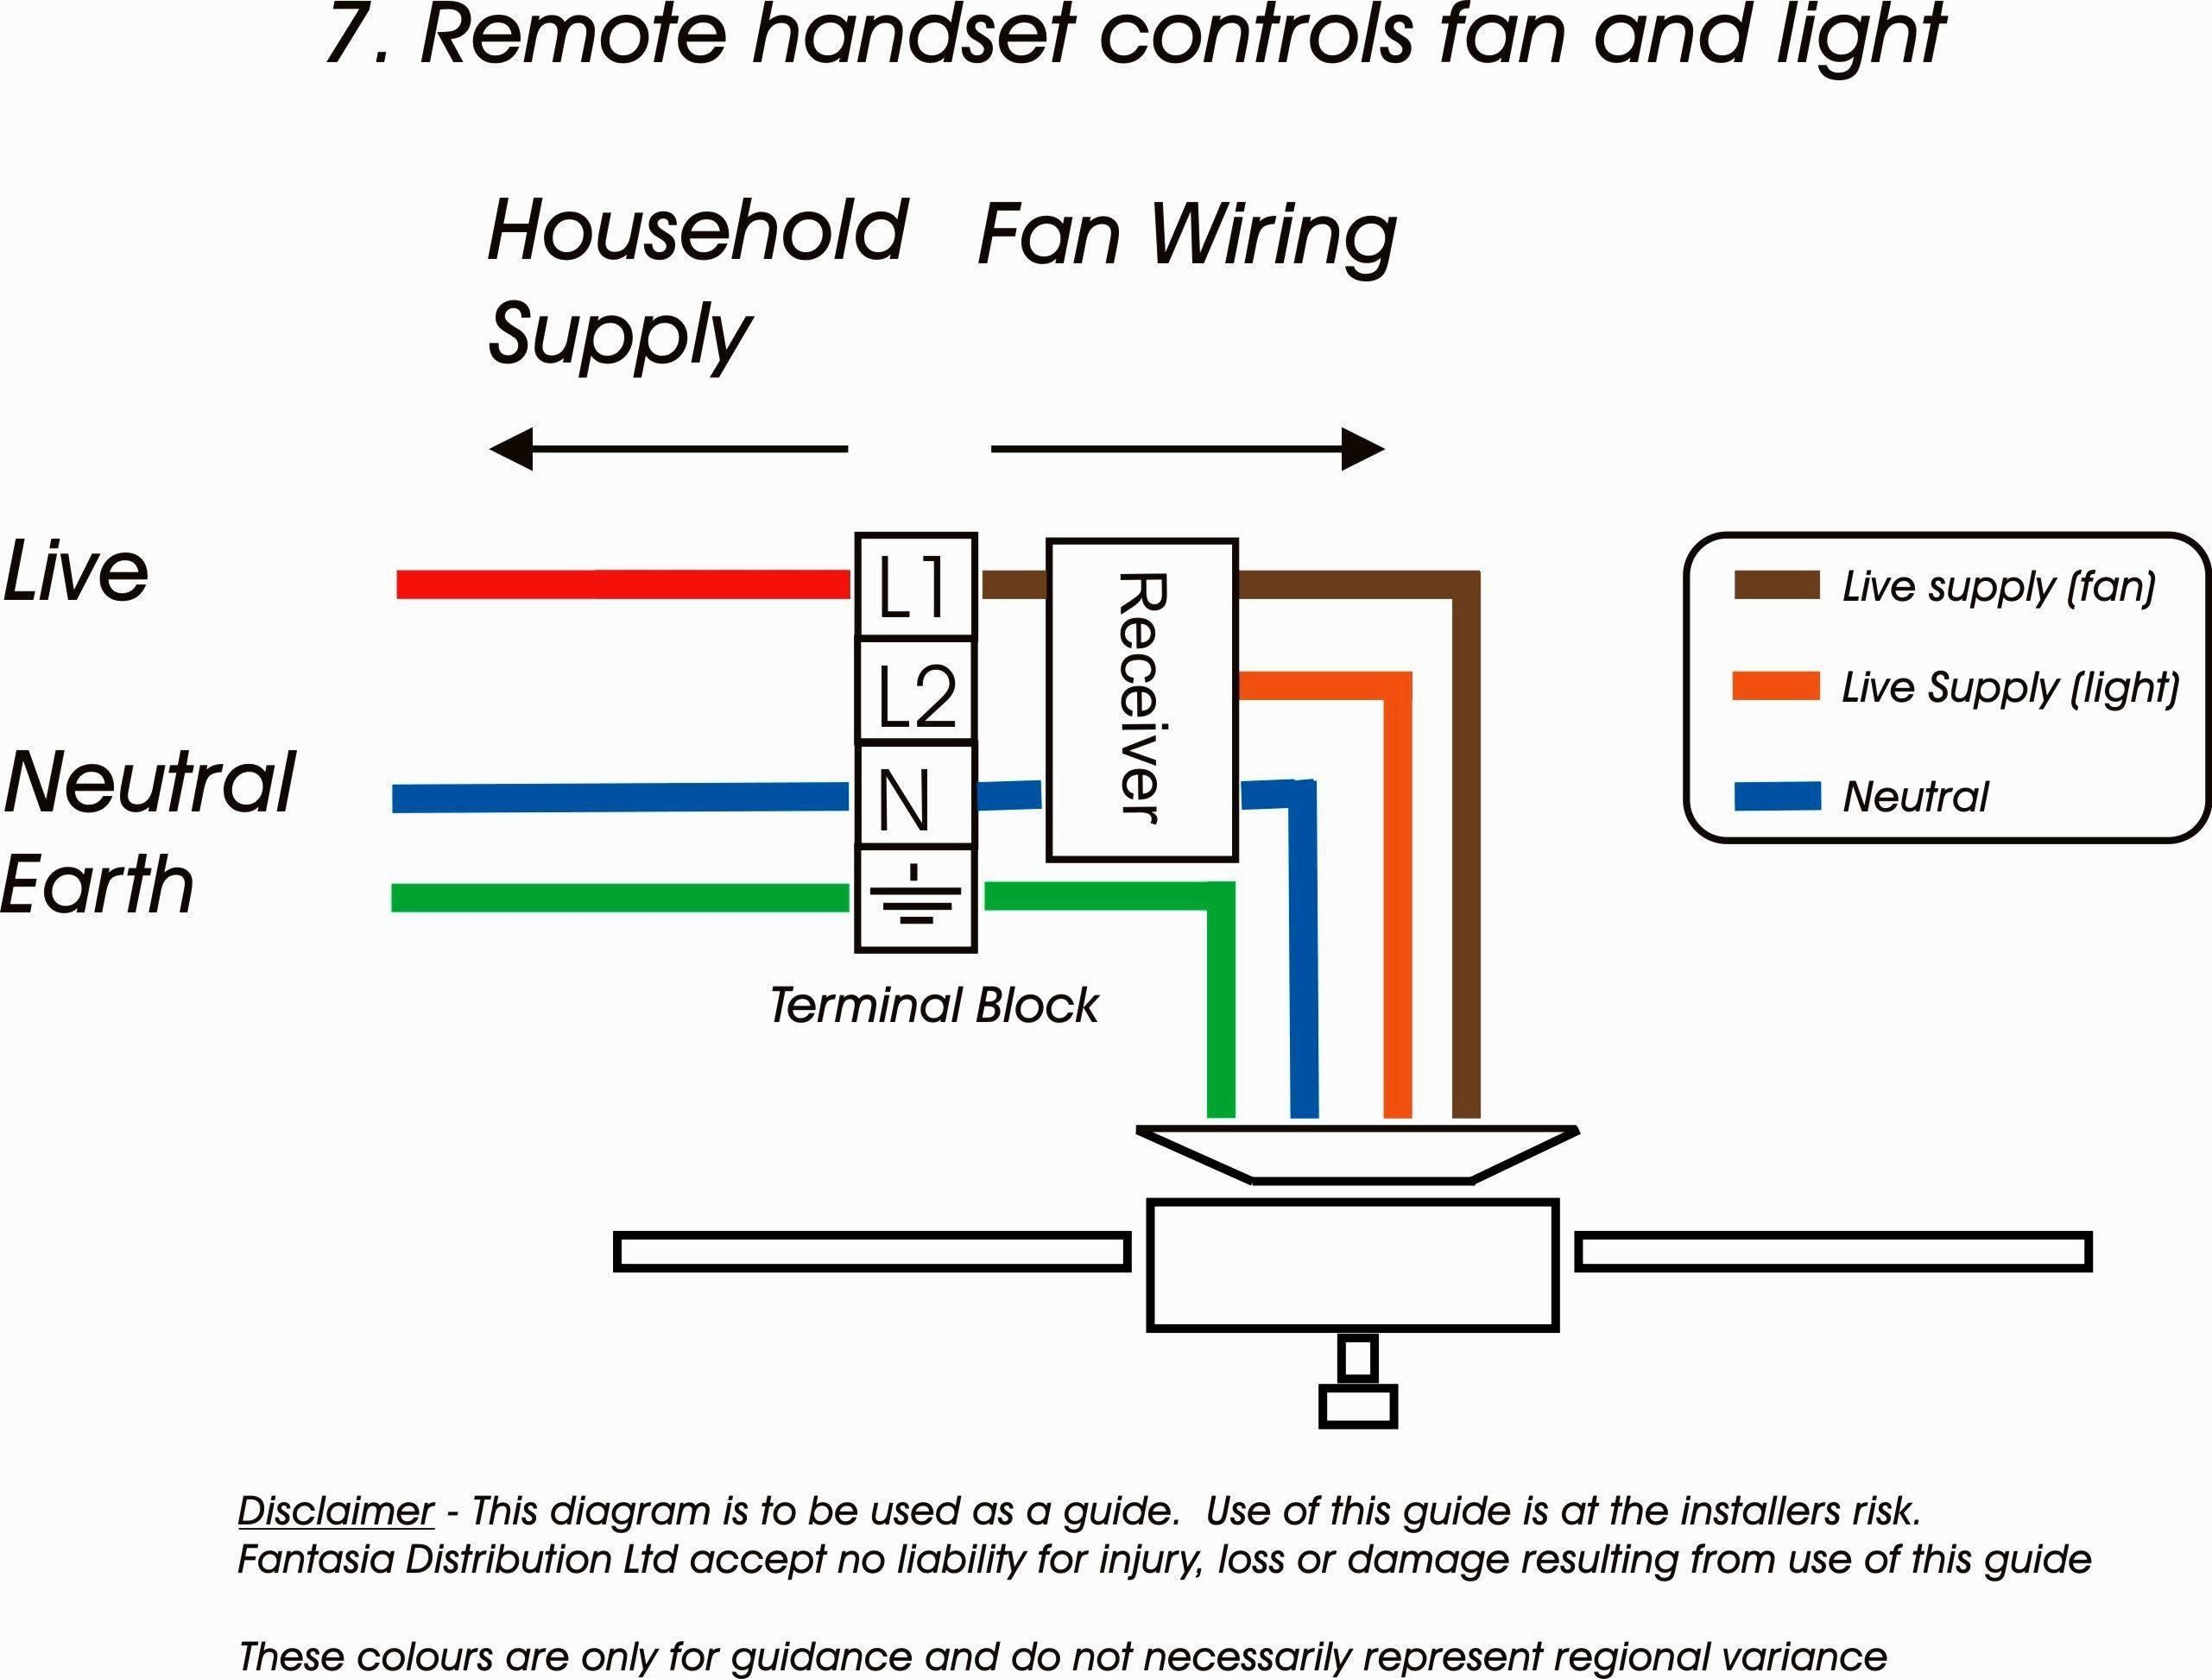 Leviton 3 Way Switch Wiring Diagram Luxury 3 Way Wiring Diagram Diagram Of Leviton 3 Way Switch Wiring Diagram